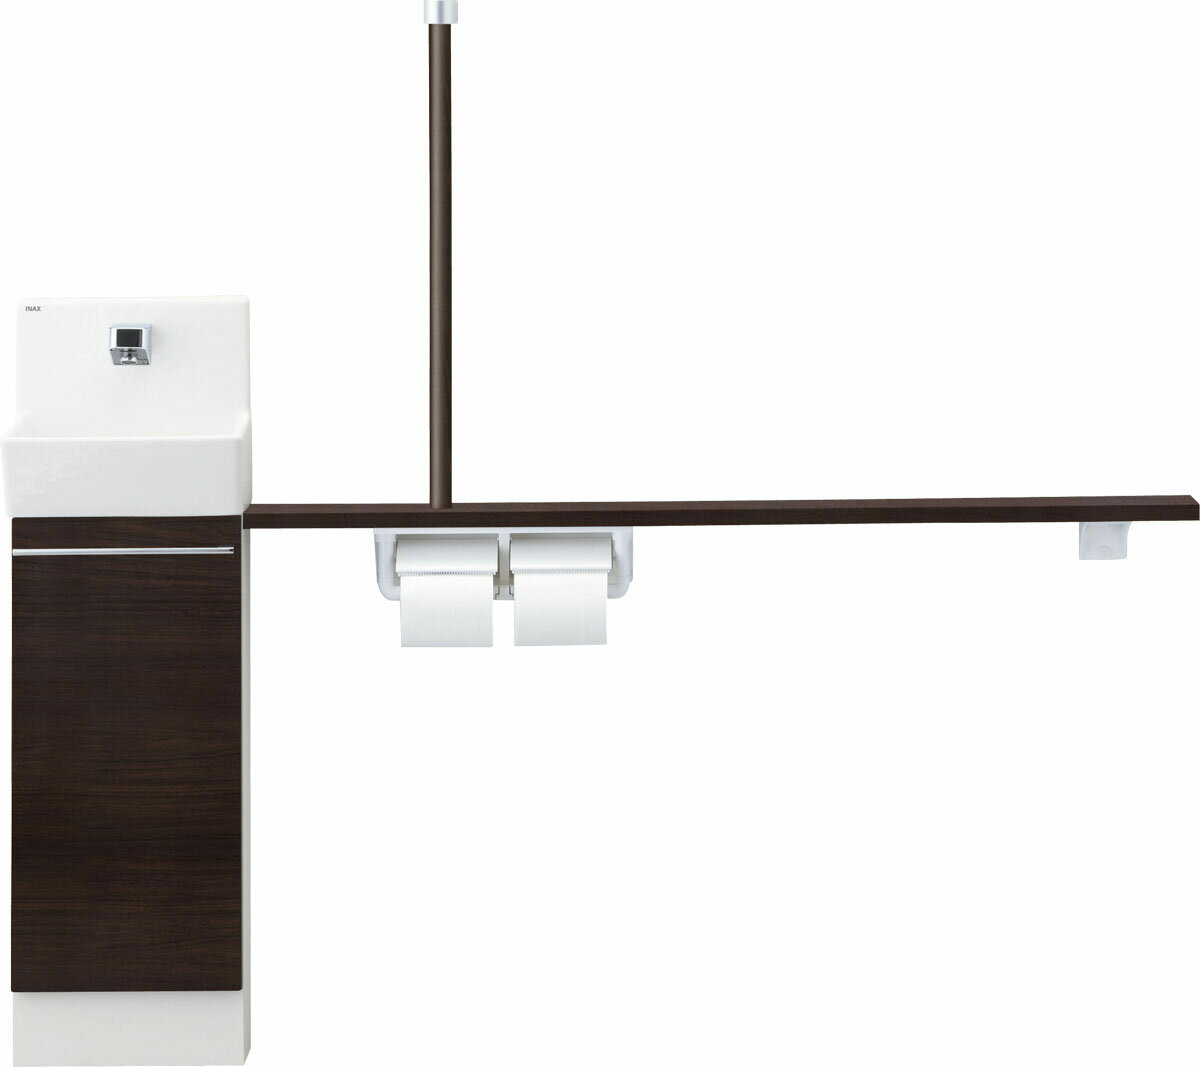 LIXIL  INAX トイレ手洗 コフレル スリム(埋込)カウンター間口1200サイズ YL-DA82VTW12B